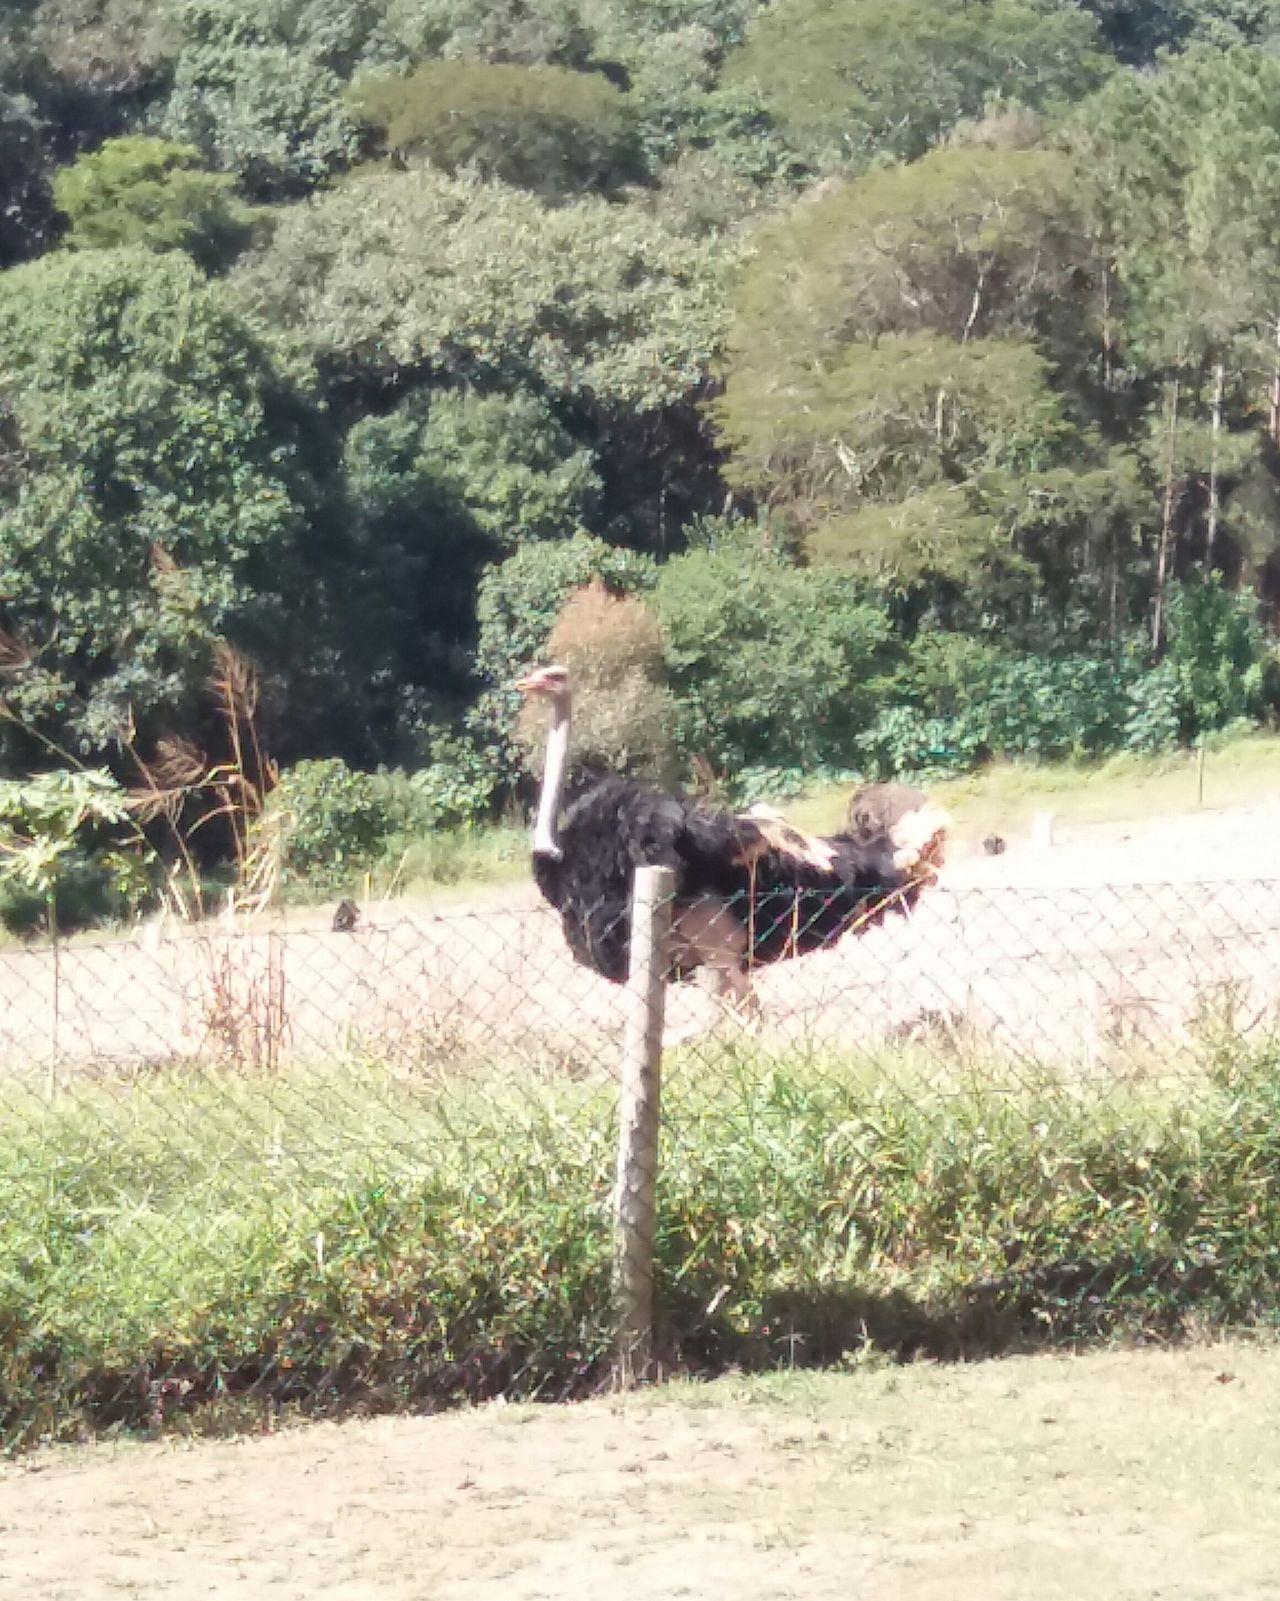 EyeEm New Here Ostrich Camel-bird Avestruz Animal Themes Beauty In Nature Zoo Outdoors Wild No People EyeEmNewHere